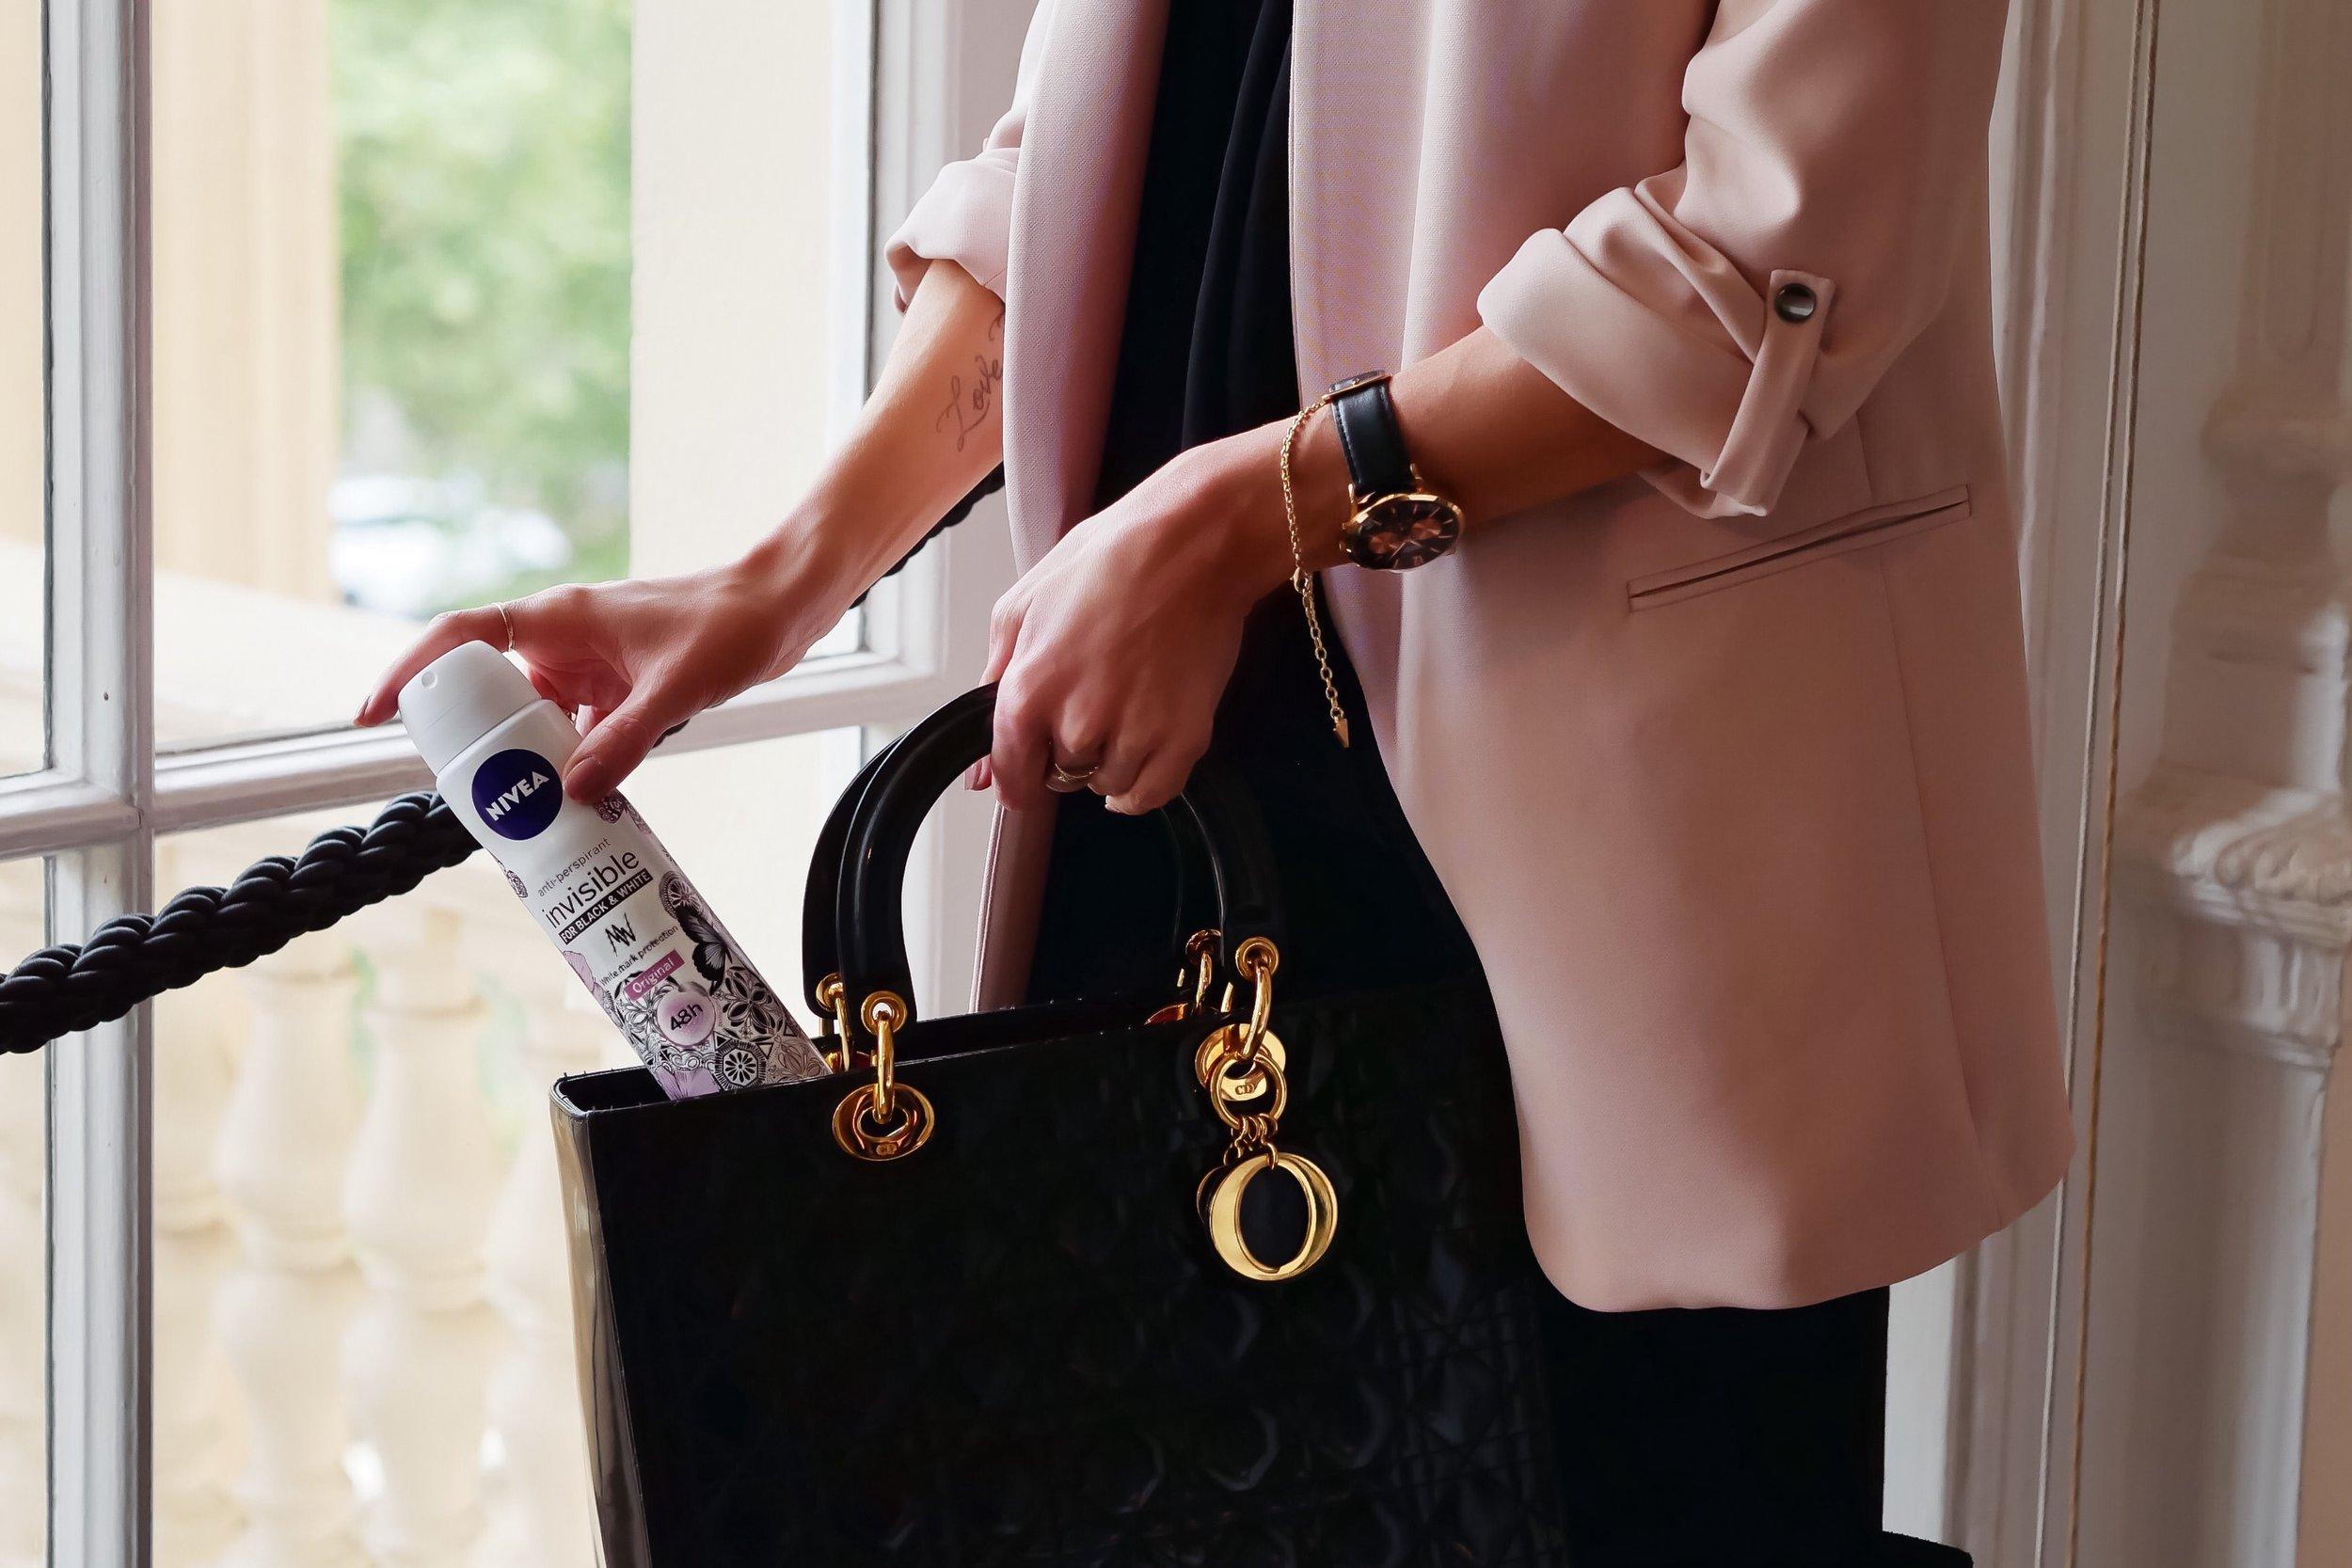 haul, affordable fashion, streetstyle, inspiration, what to wear, fashion, lookbook, style, fashion blogger, laura blair, youtuber, london fashion girl, nivea, matthew williamson, black and white deodorant